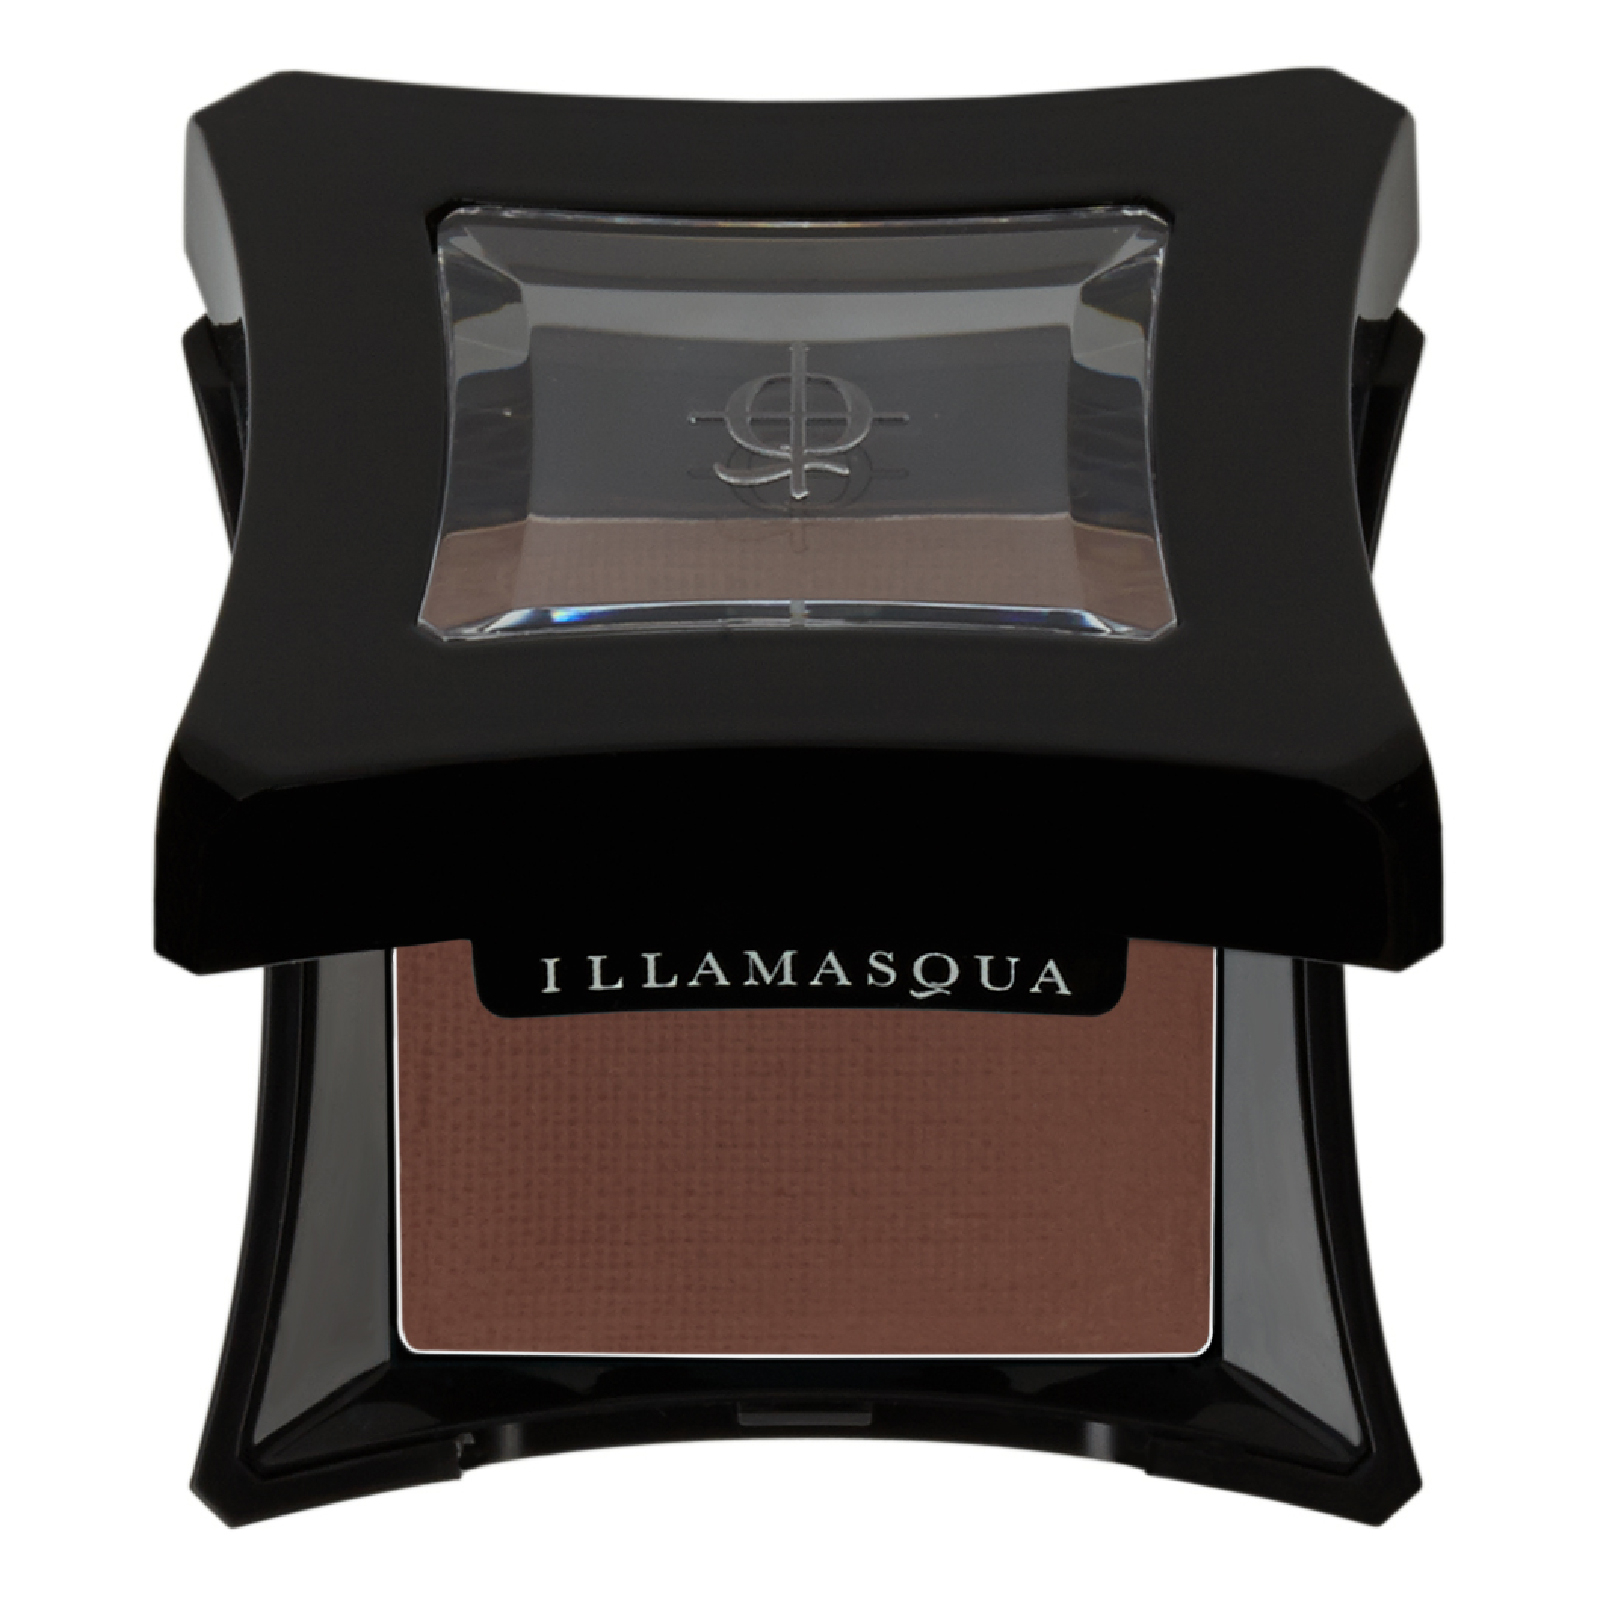 illamasqua powder eye shadow 2g (various shades) - truth